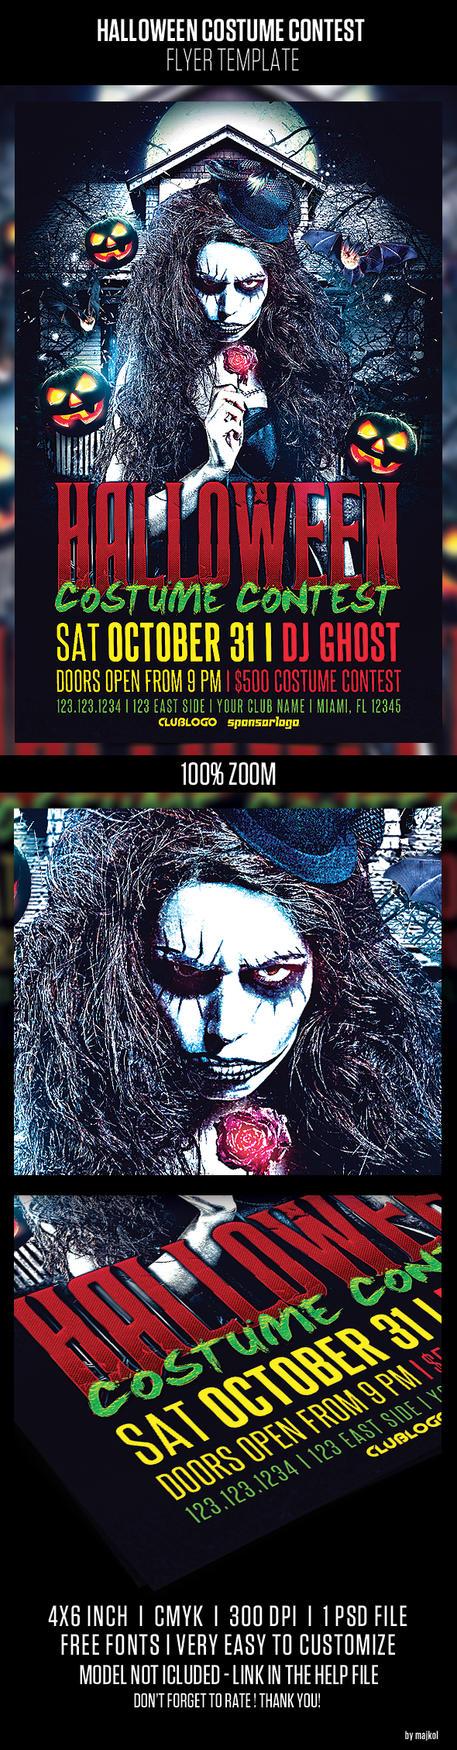 Halloween Costume Contest Flyer by majkolthemez